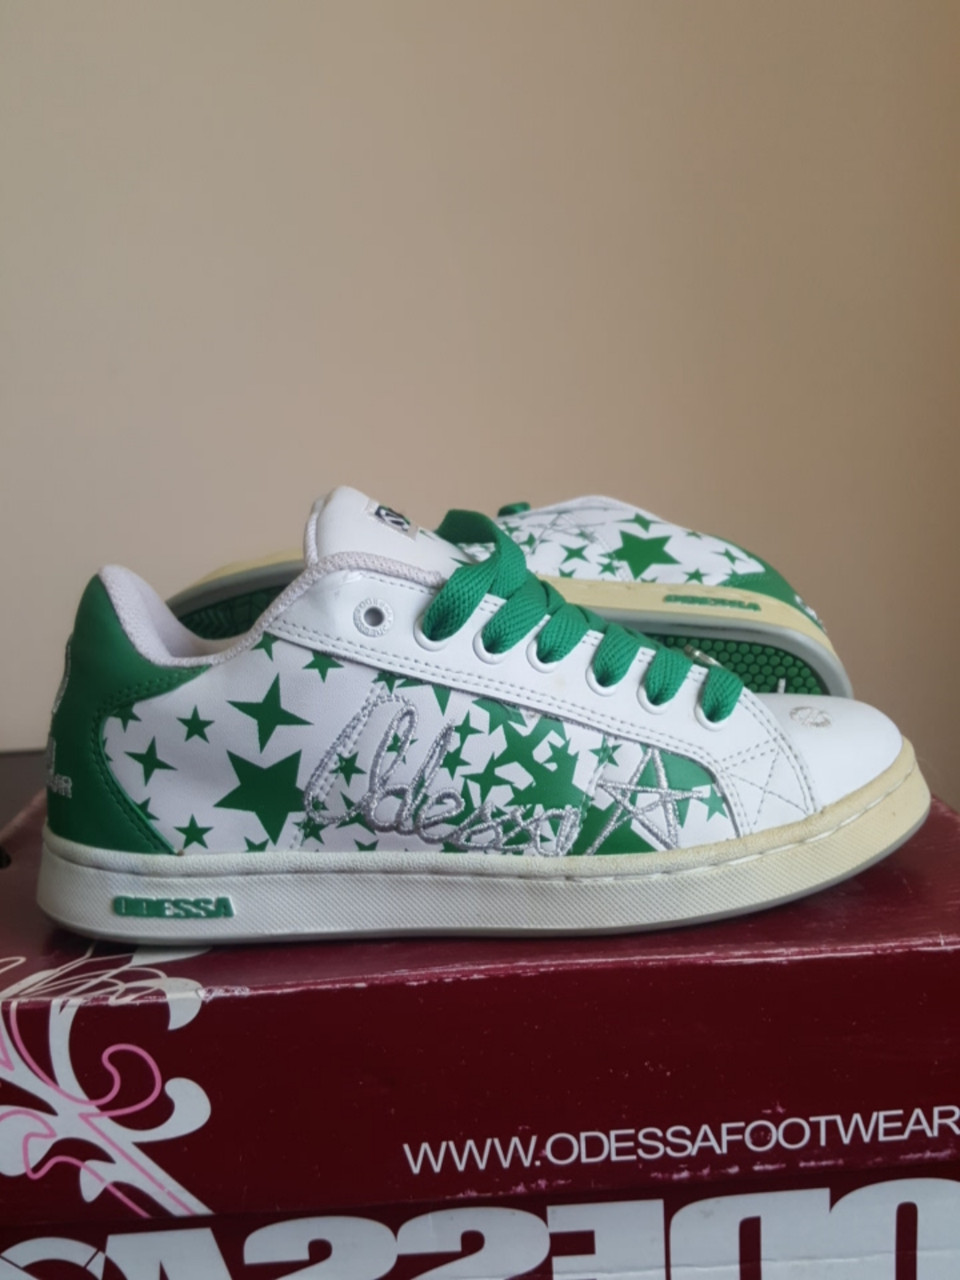 Кроссовки Odessa Baker Gstars wht/green/sil размер 38 (24 см). Уценка